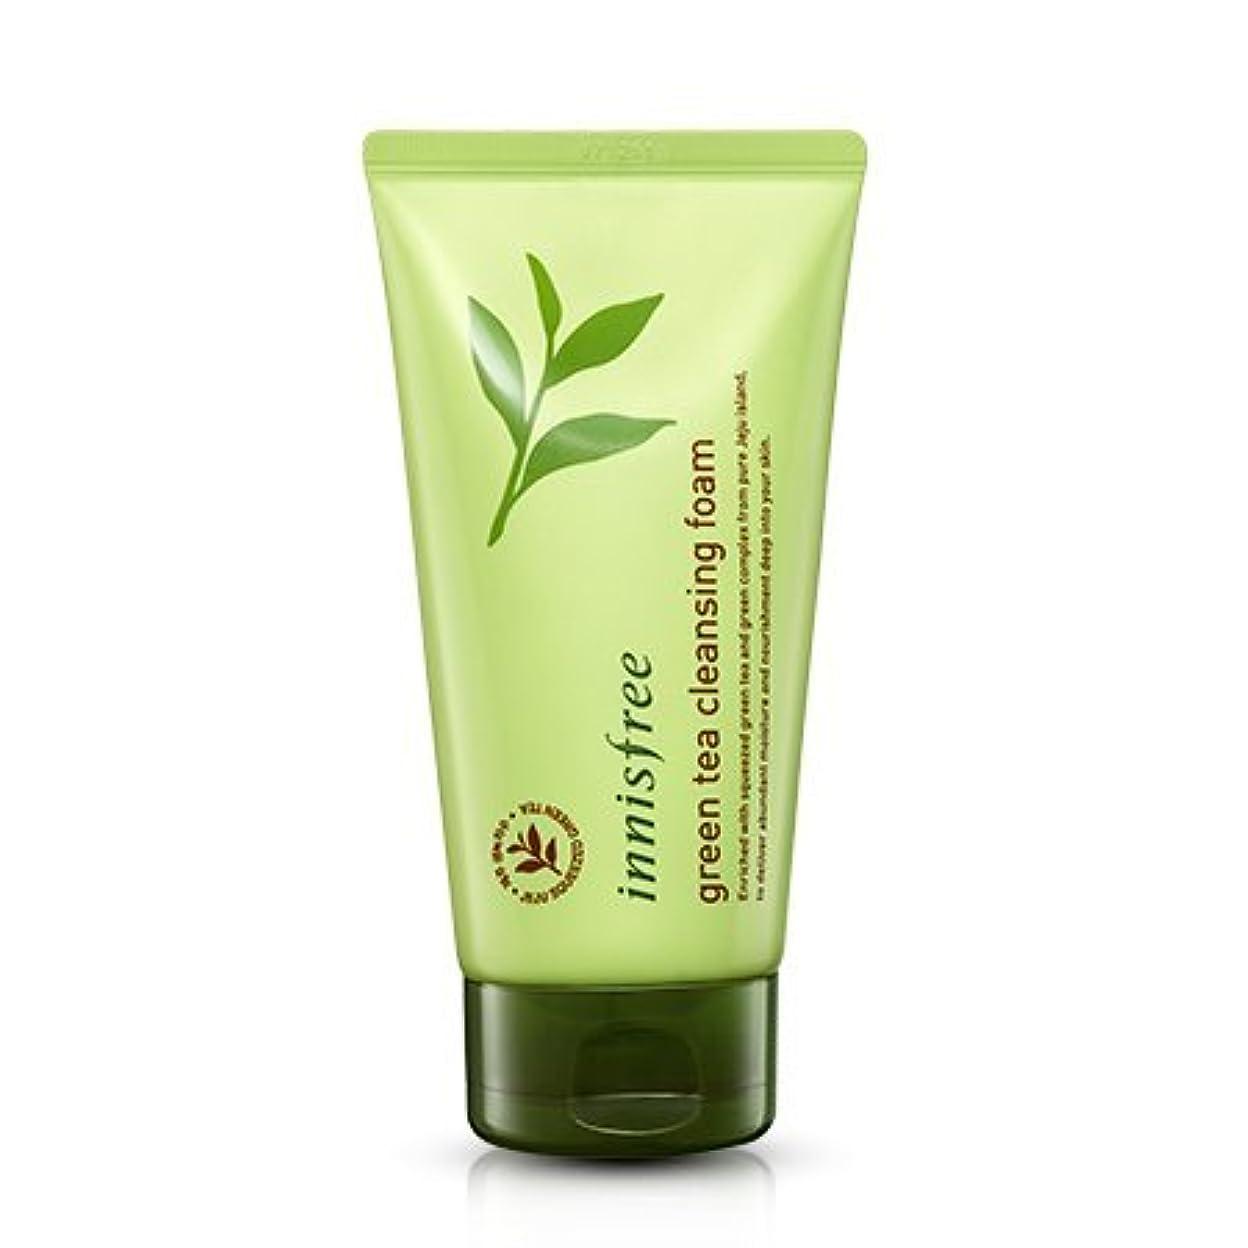 (Innisfree イニスフリー) GREEN TEA CLEANSING FOAM グリーンティー クレンジング フォーム 洗顔フォーム 洗顔料